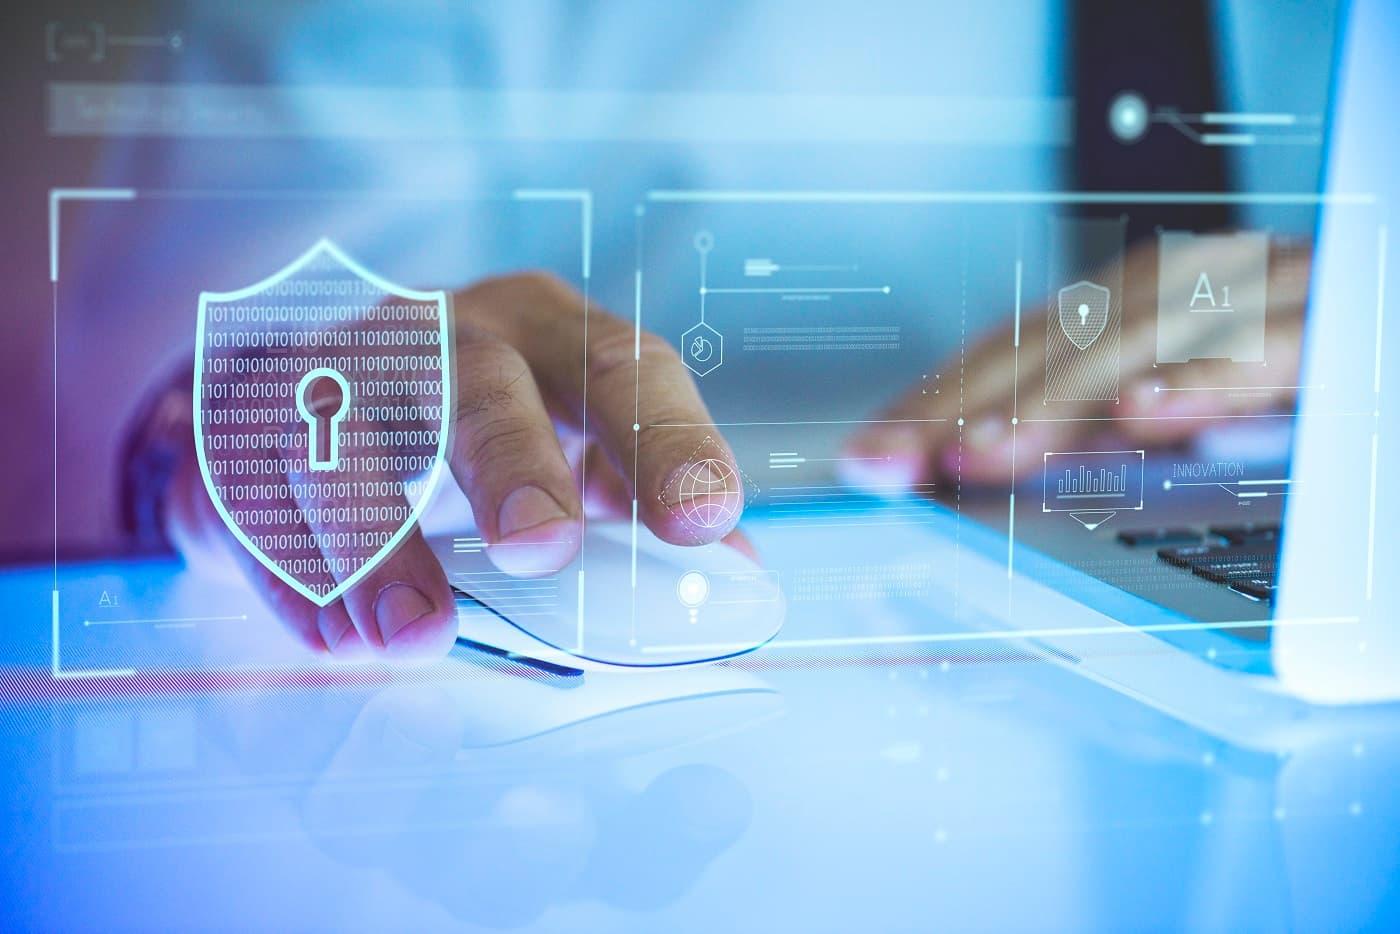 Concepto de protección de datos sensibles